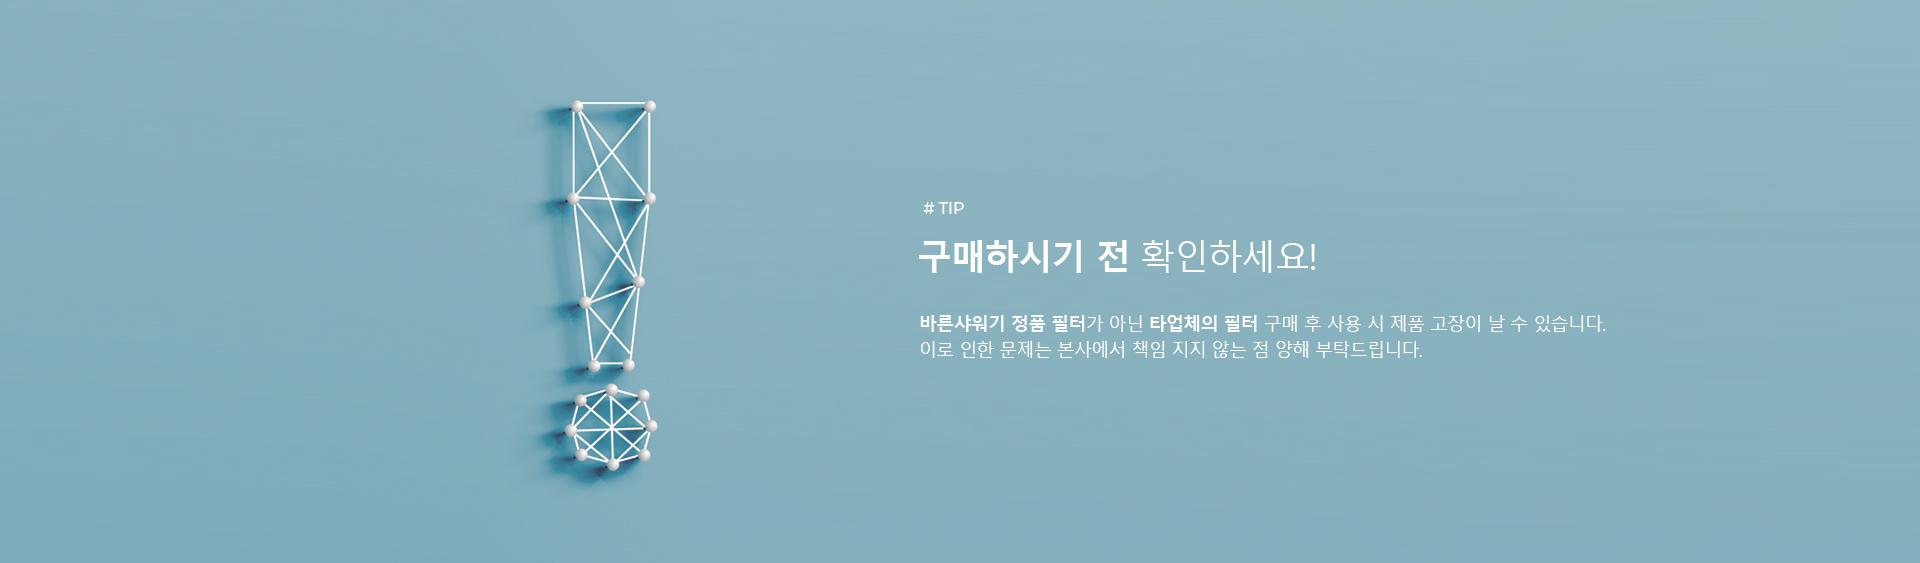 [ShiPAPA] WHIA|Filter Shower Head | 韓國直送🇰🇷 | 香港 澳門